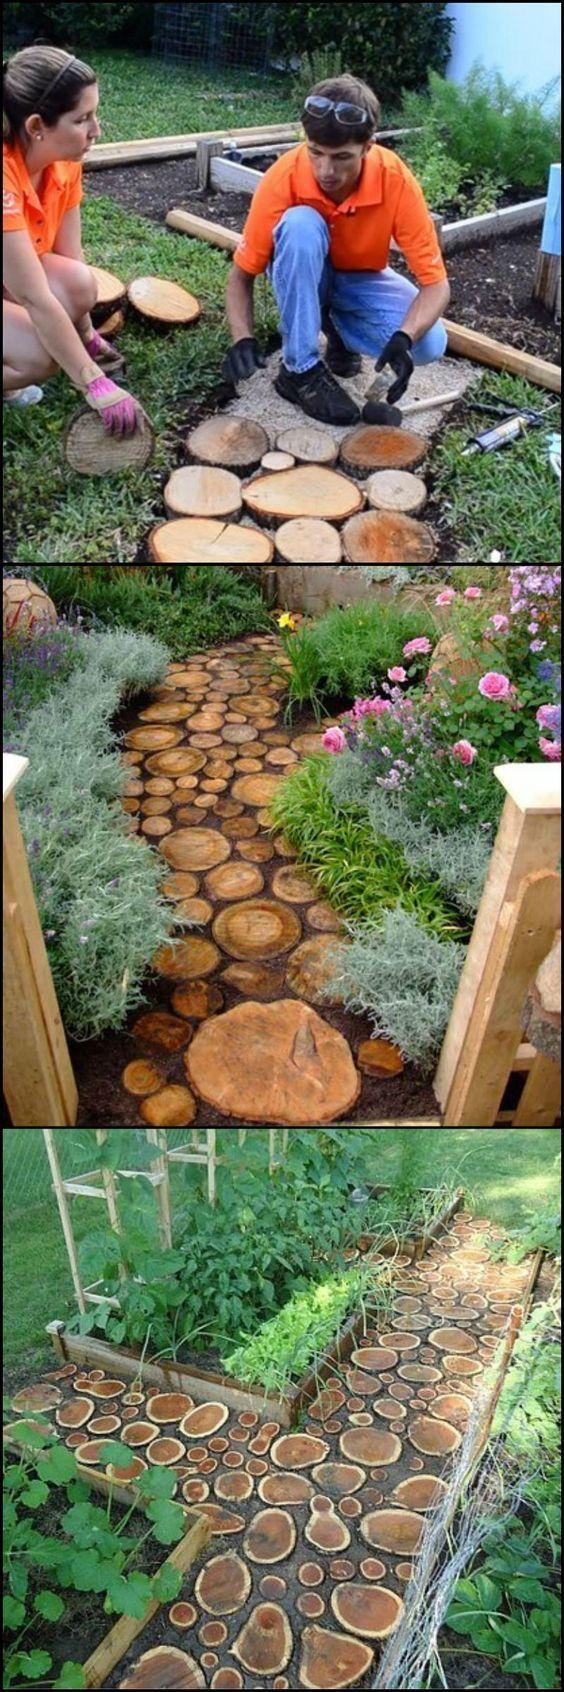 Log Design Idea Garden Paths Backyard Landscaping Backyard Backyard gardening for profit